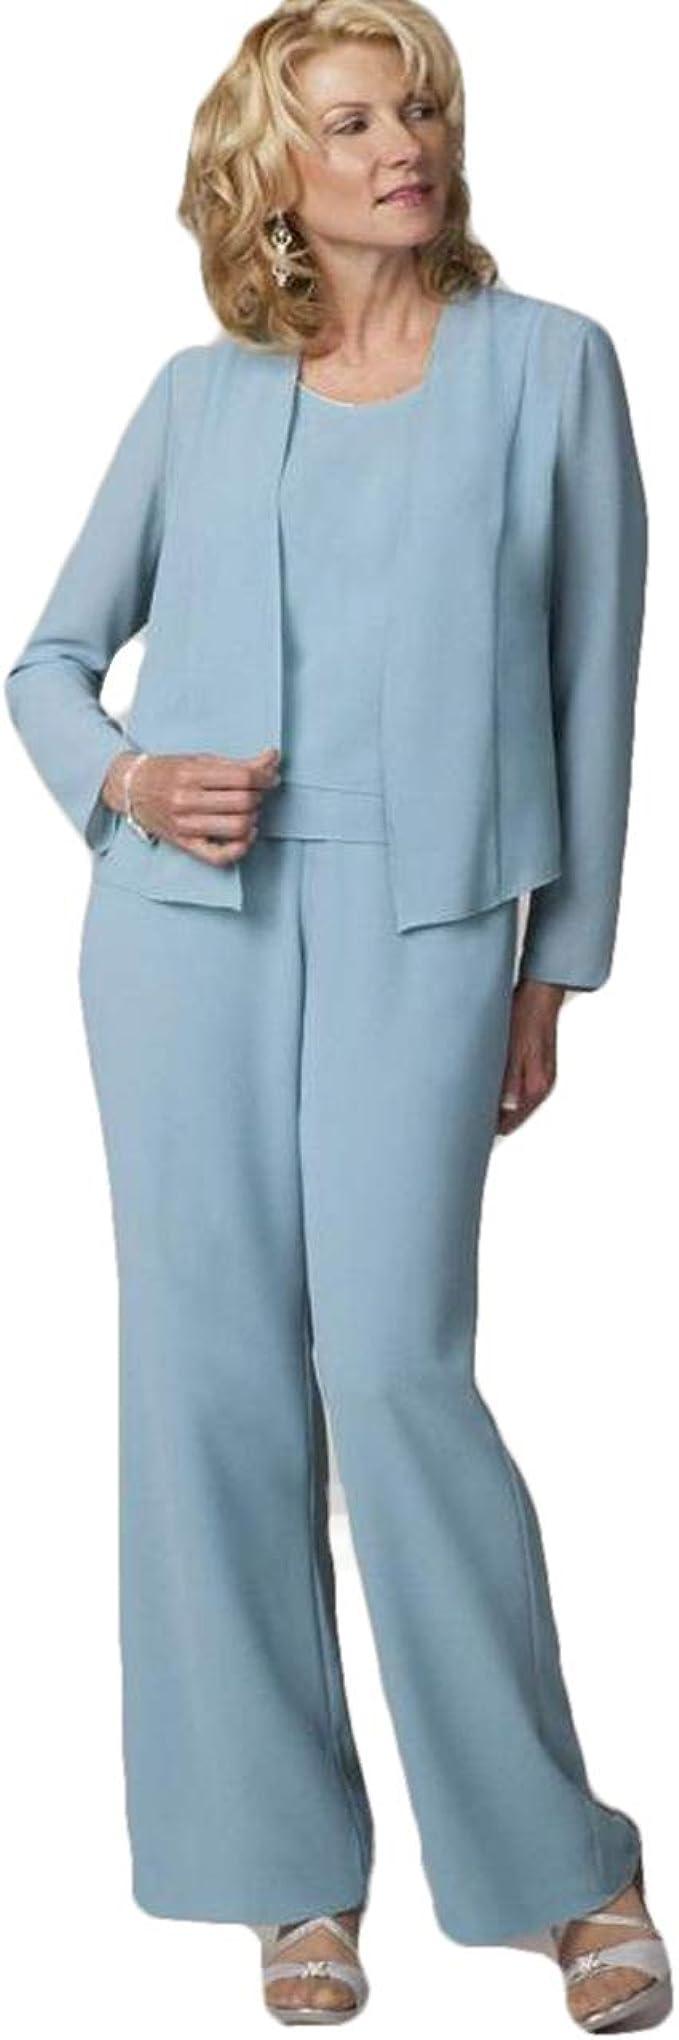 Amazon.com: WZW - Pantalón para madre de la novia, color ...